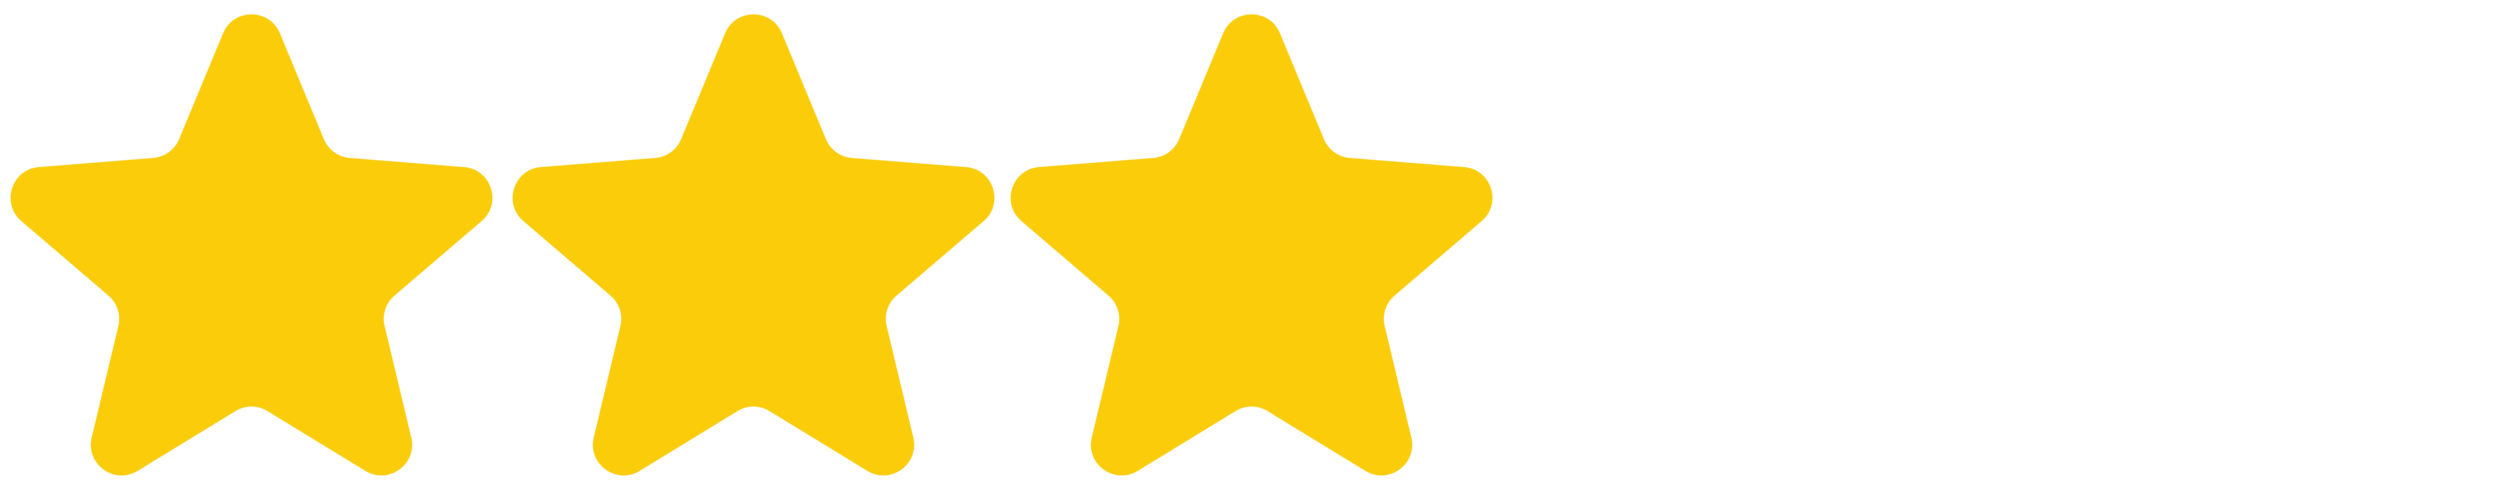 - (3 stars)